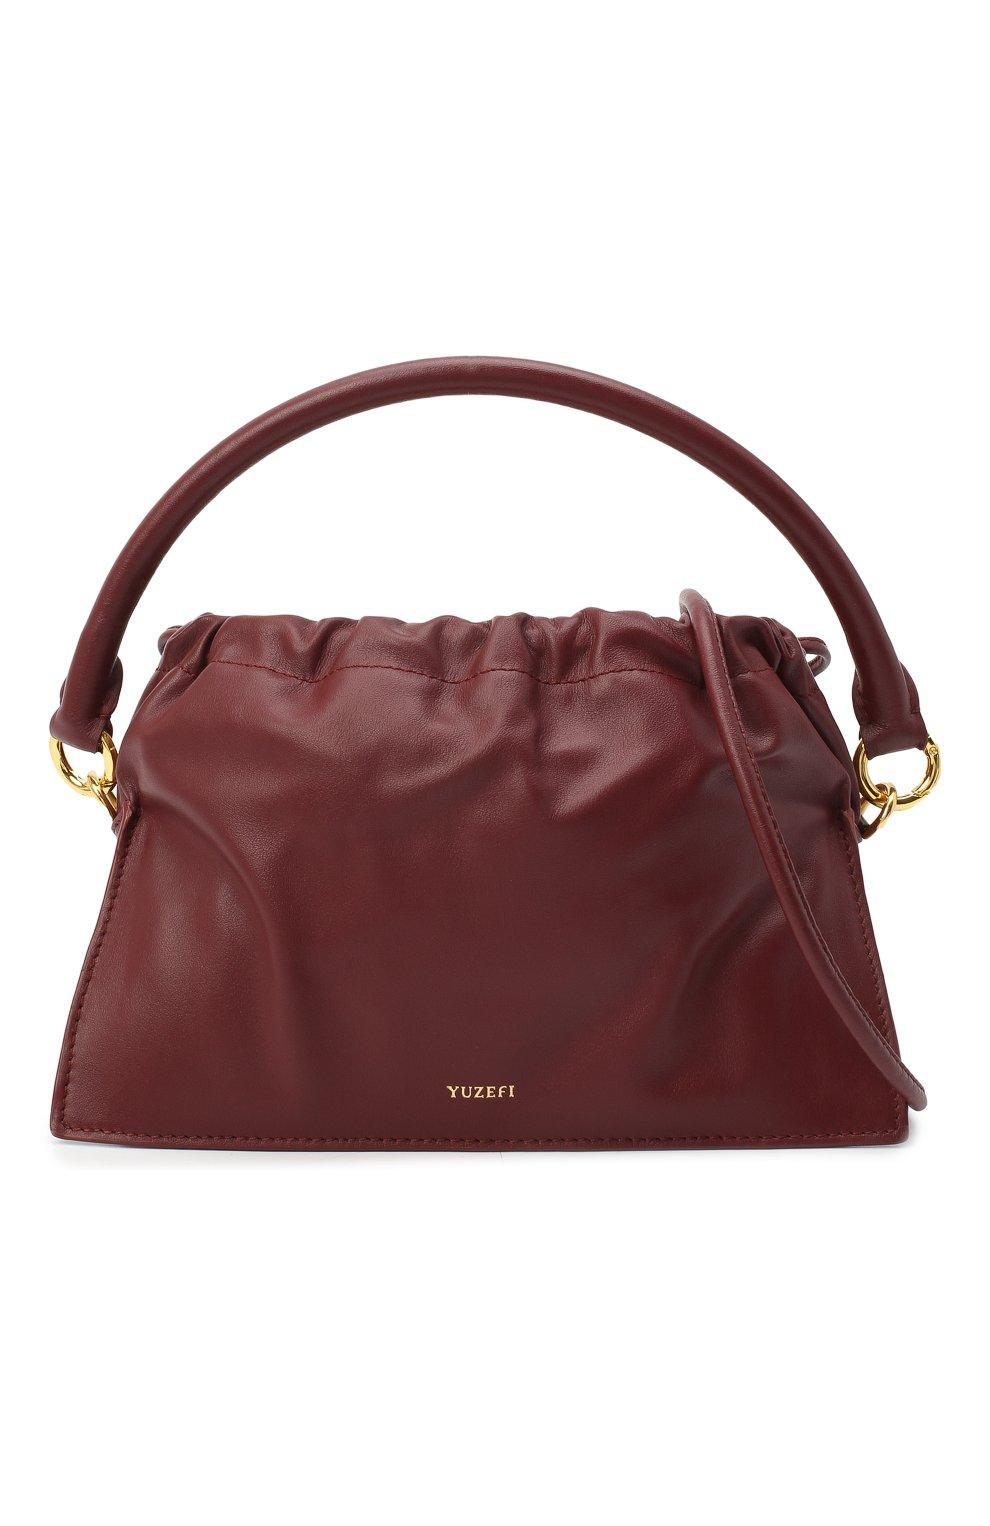 Женская сумка bom mini YUZEFI бордового цвета, арт. YUZAW20-HB-B0-02 | Фото 6 (Сумки-технические: Сумки через плечо, Сумки top-handle; Материал: Натуральная кожа; Размер: mini; Ремень/цепочка: На ремешке)